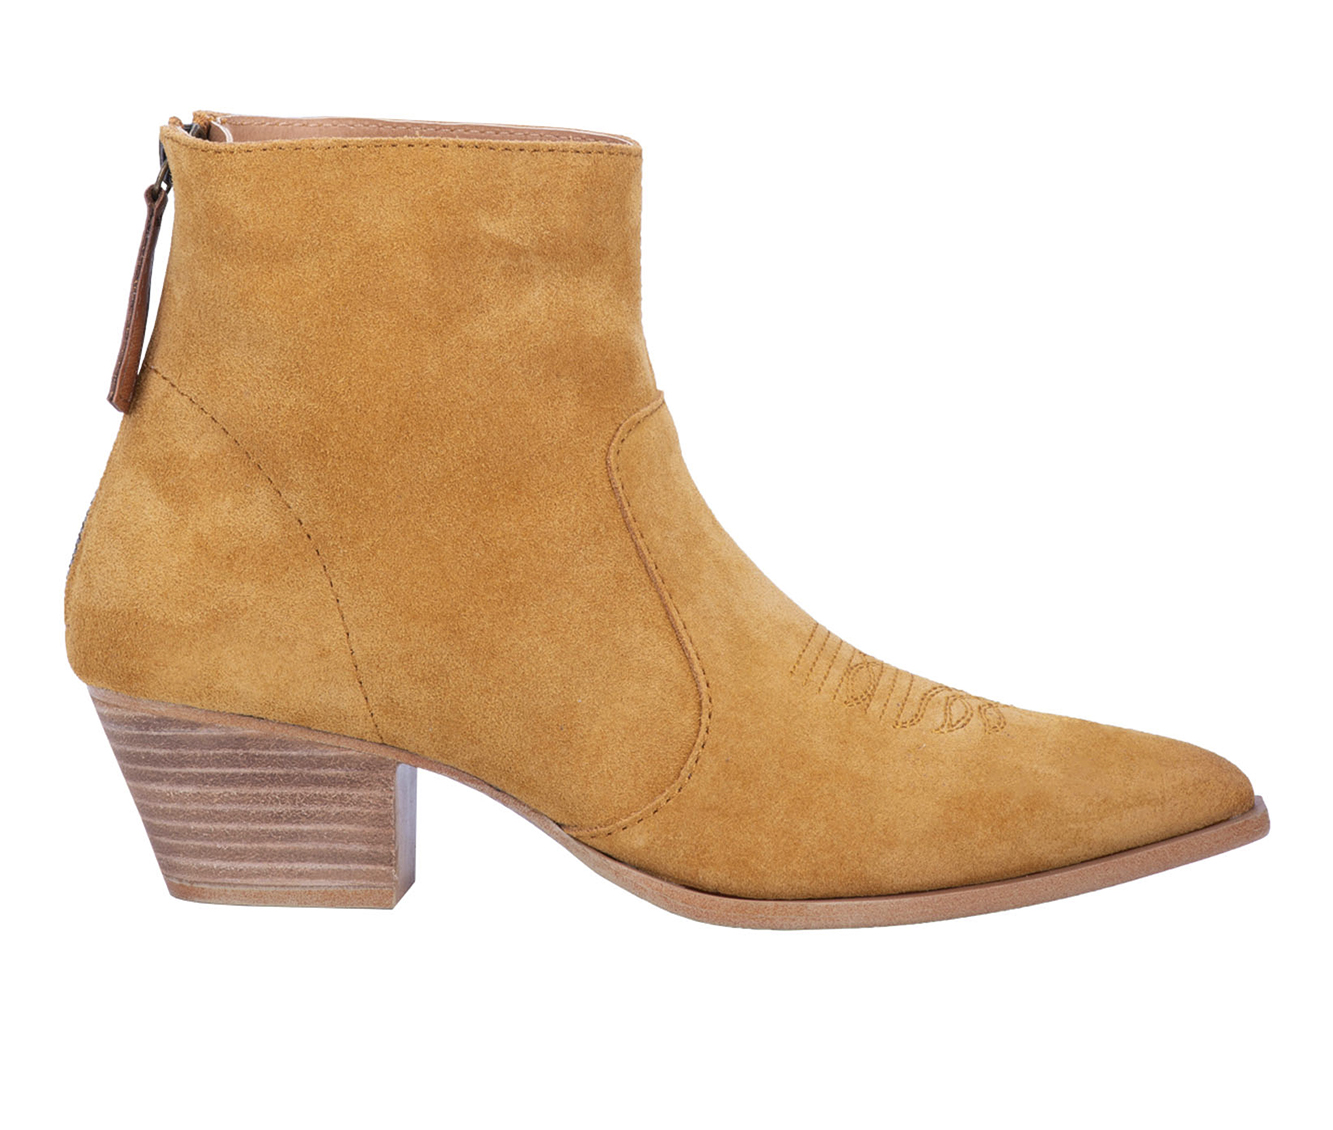 Dingo Boots Klanton Women's Boots (Yellow - Leather)